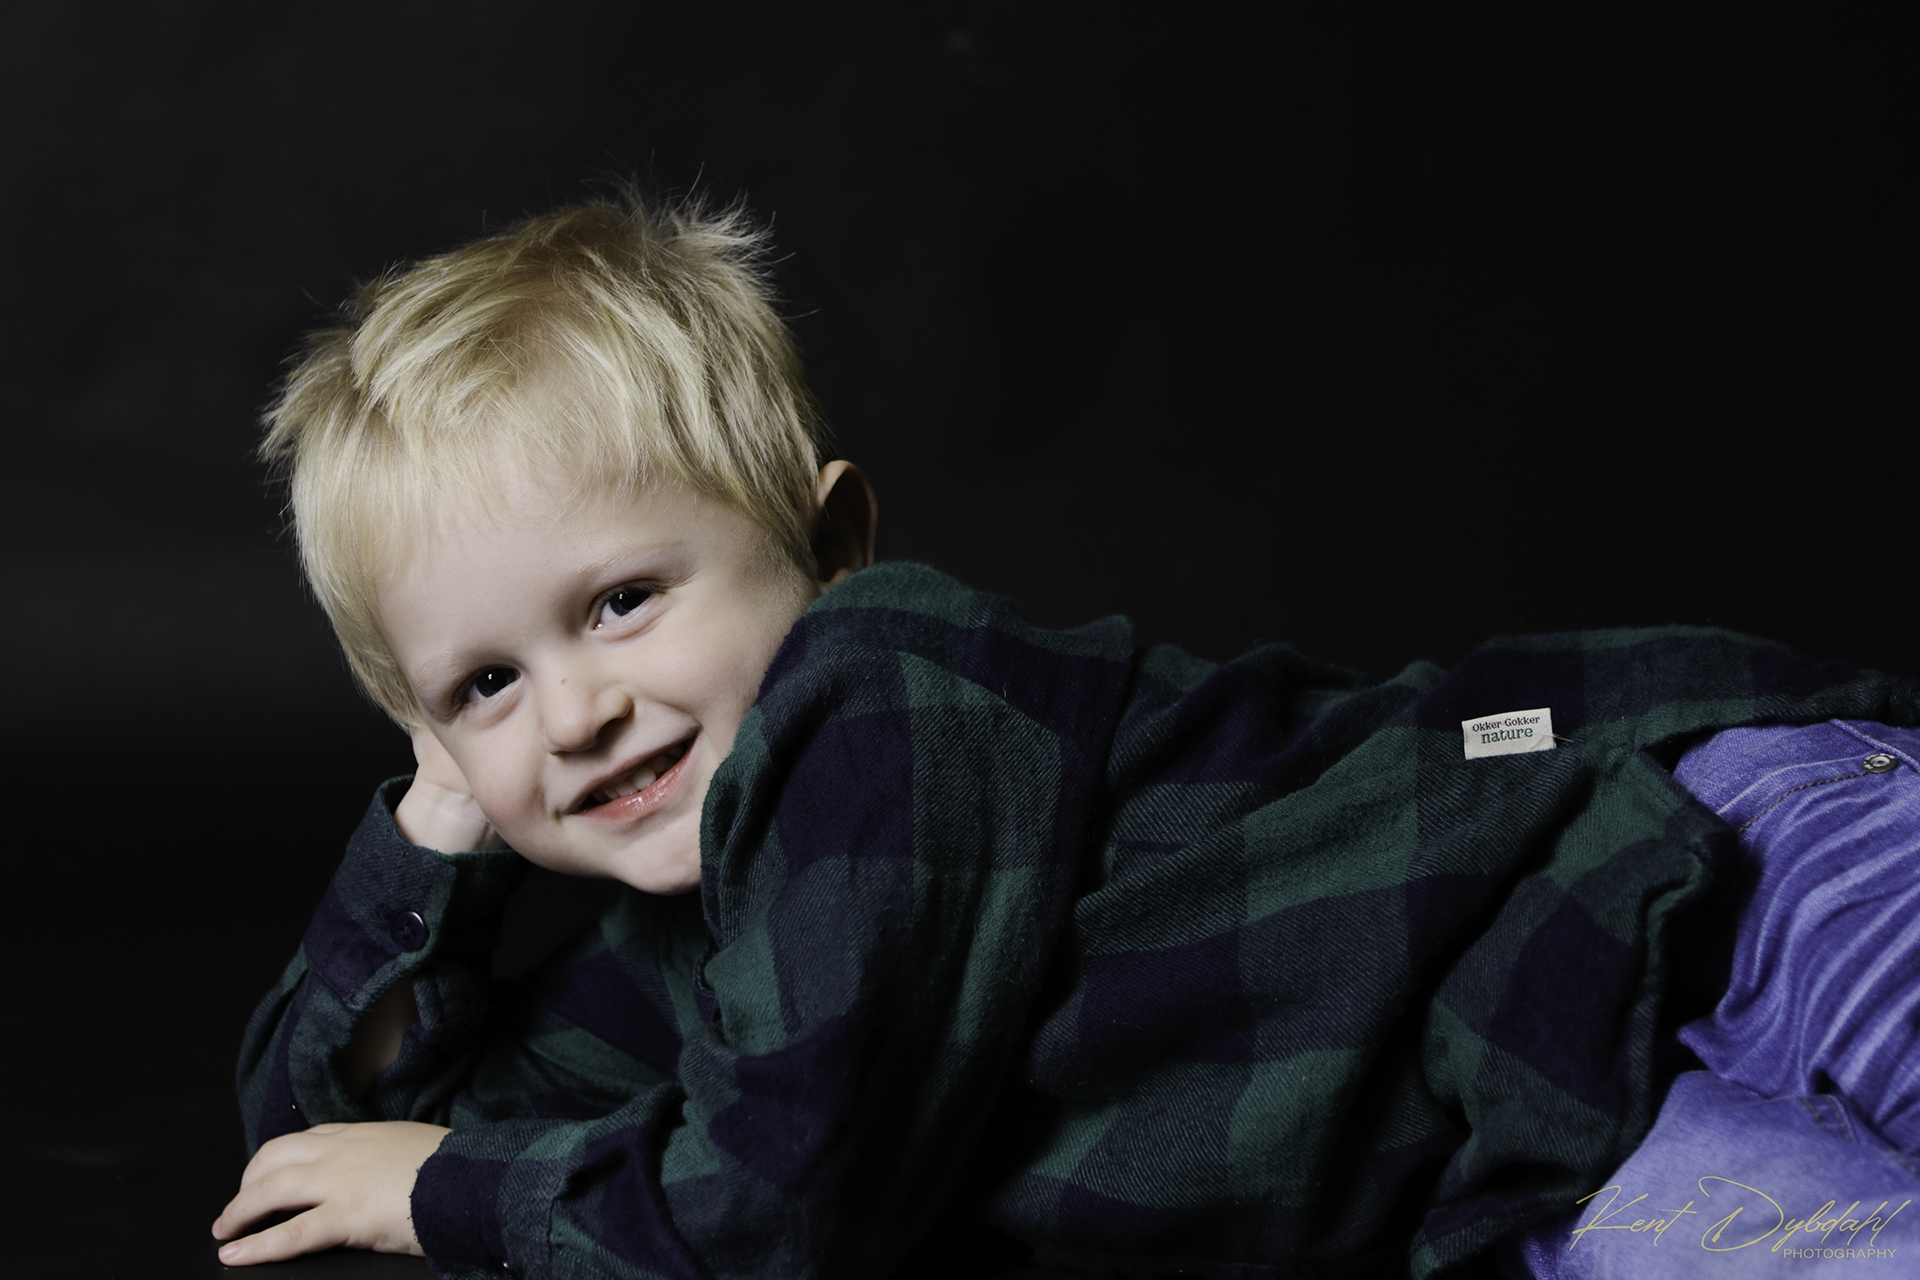 © Fotos Børn dybdahls.dk.